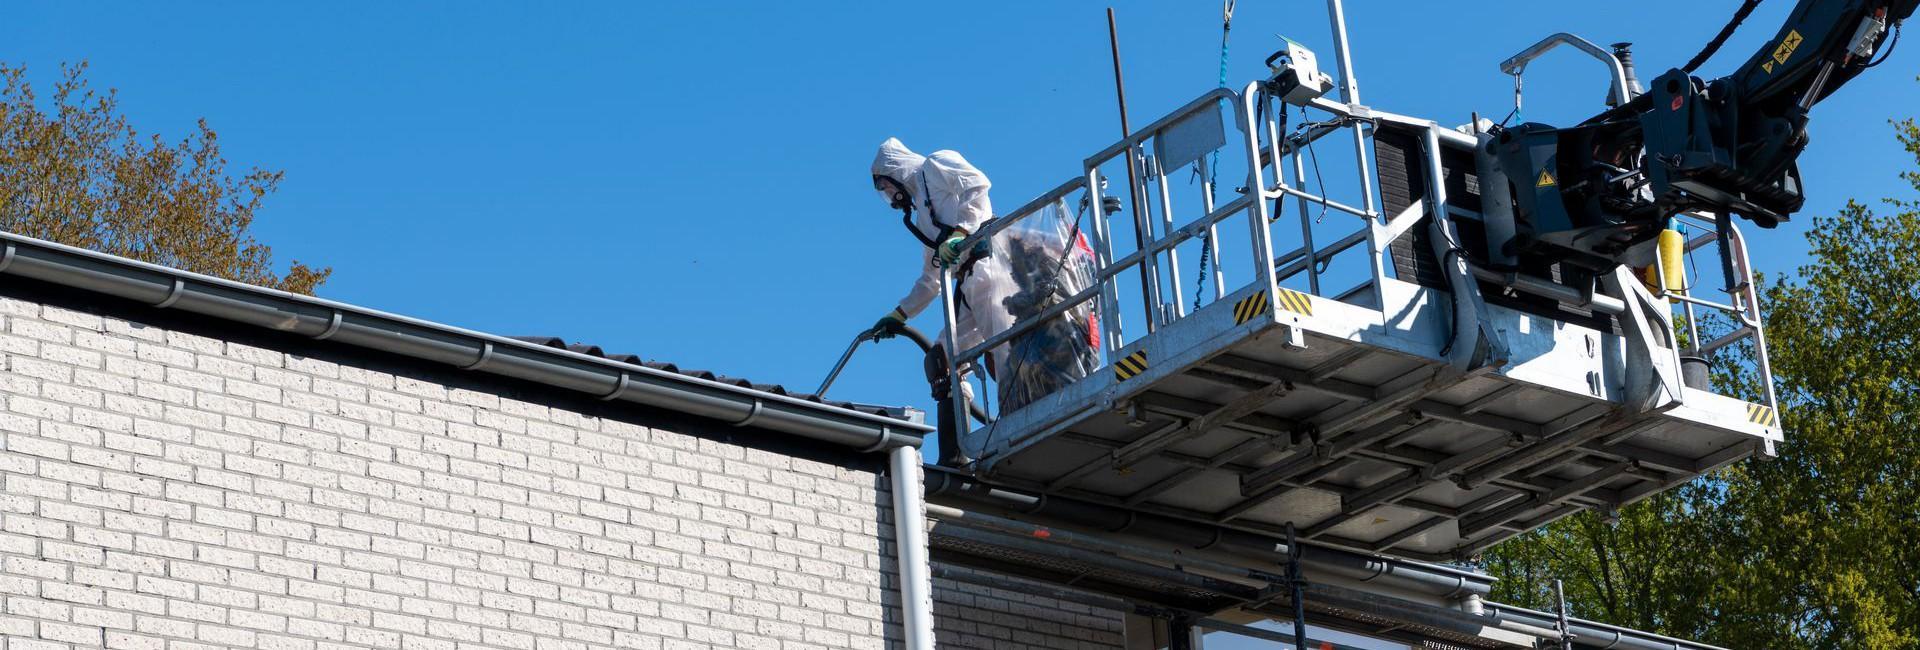 Professionele asbestsanering